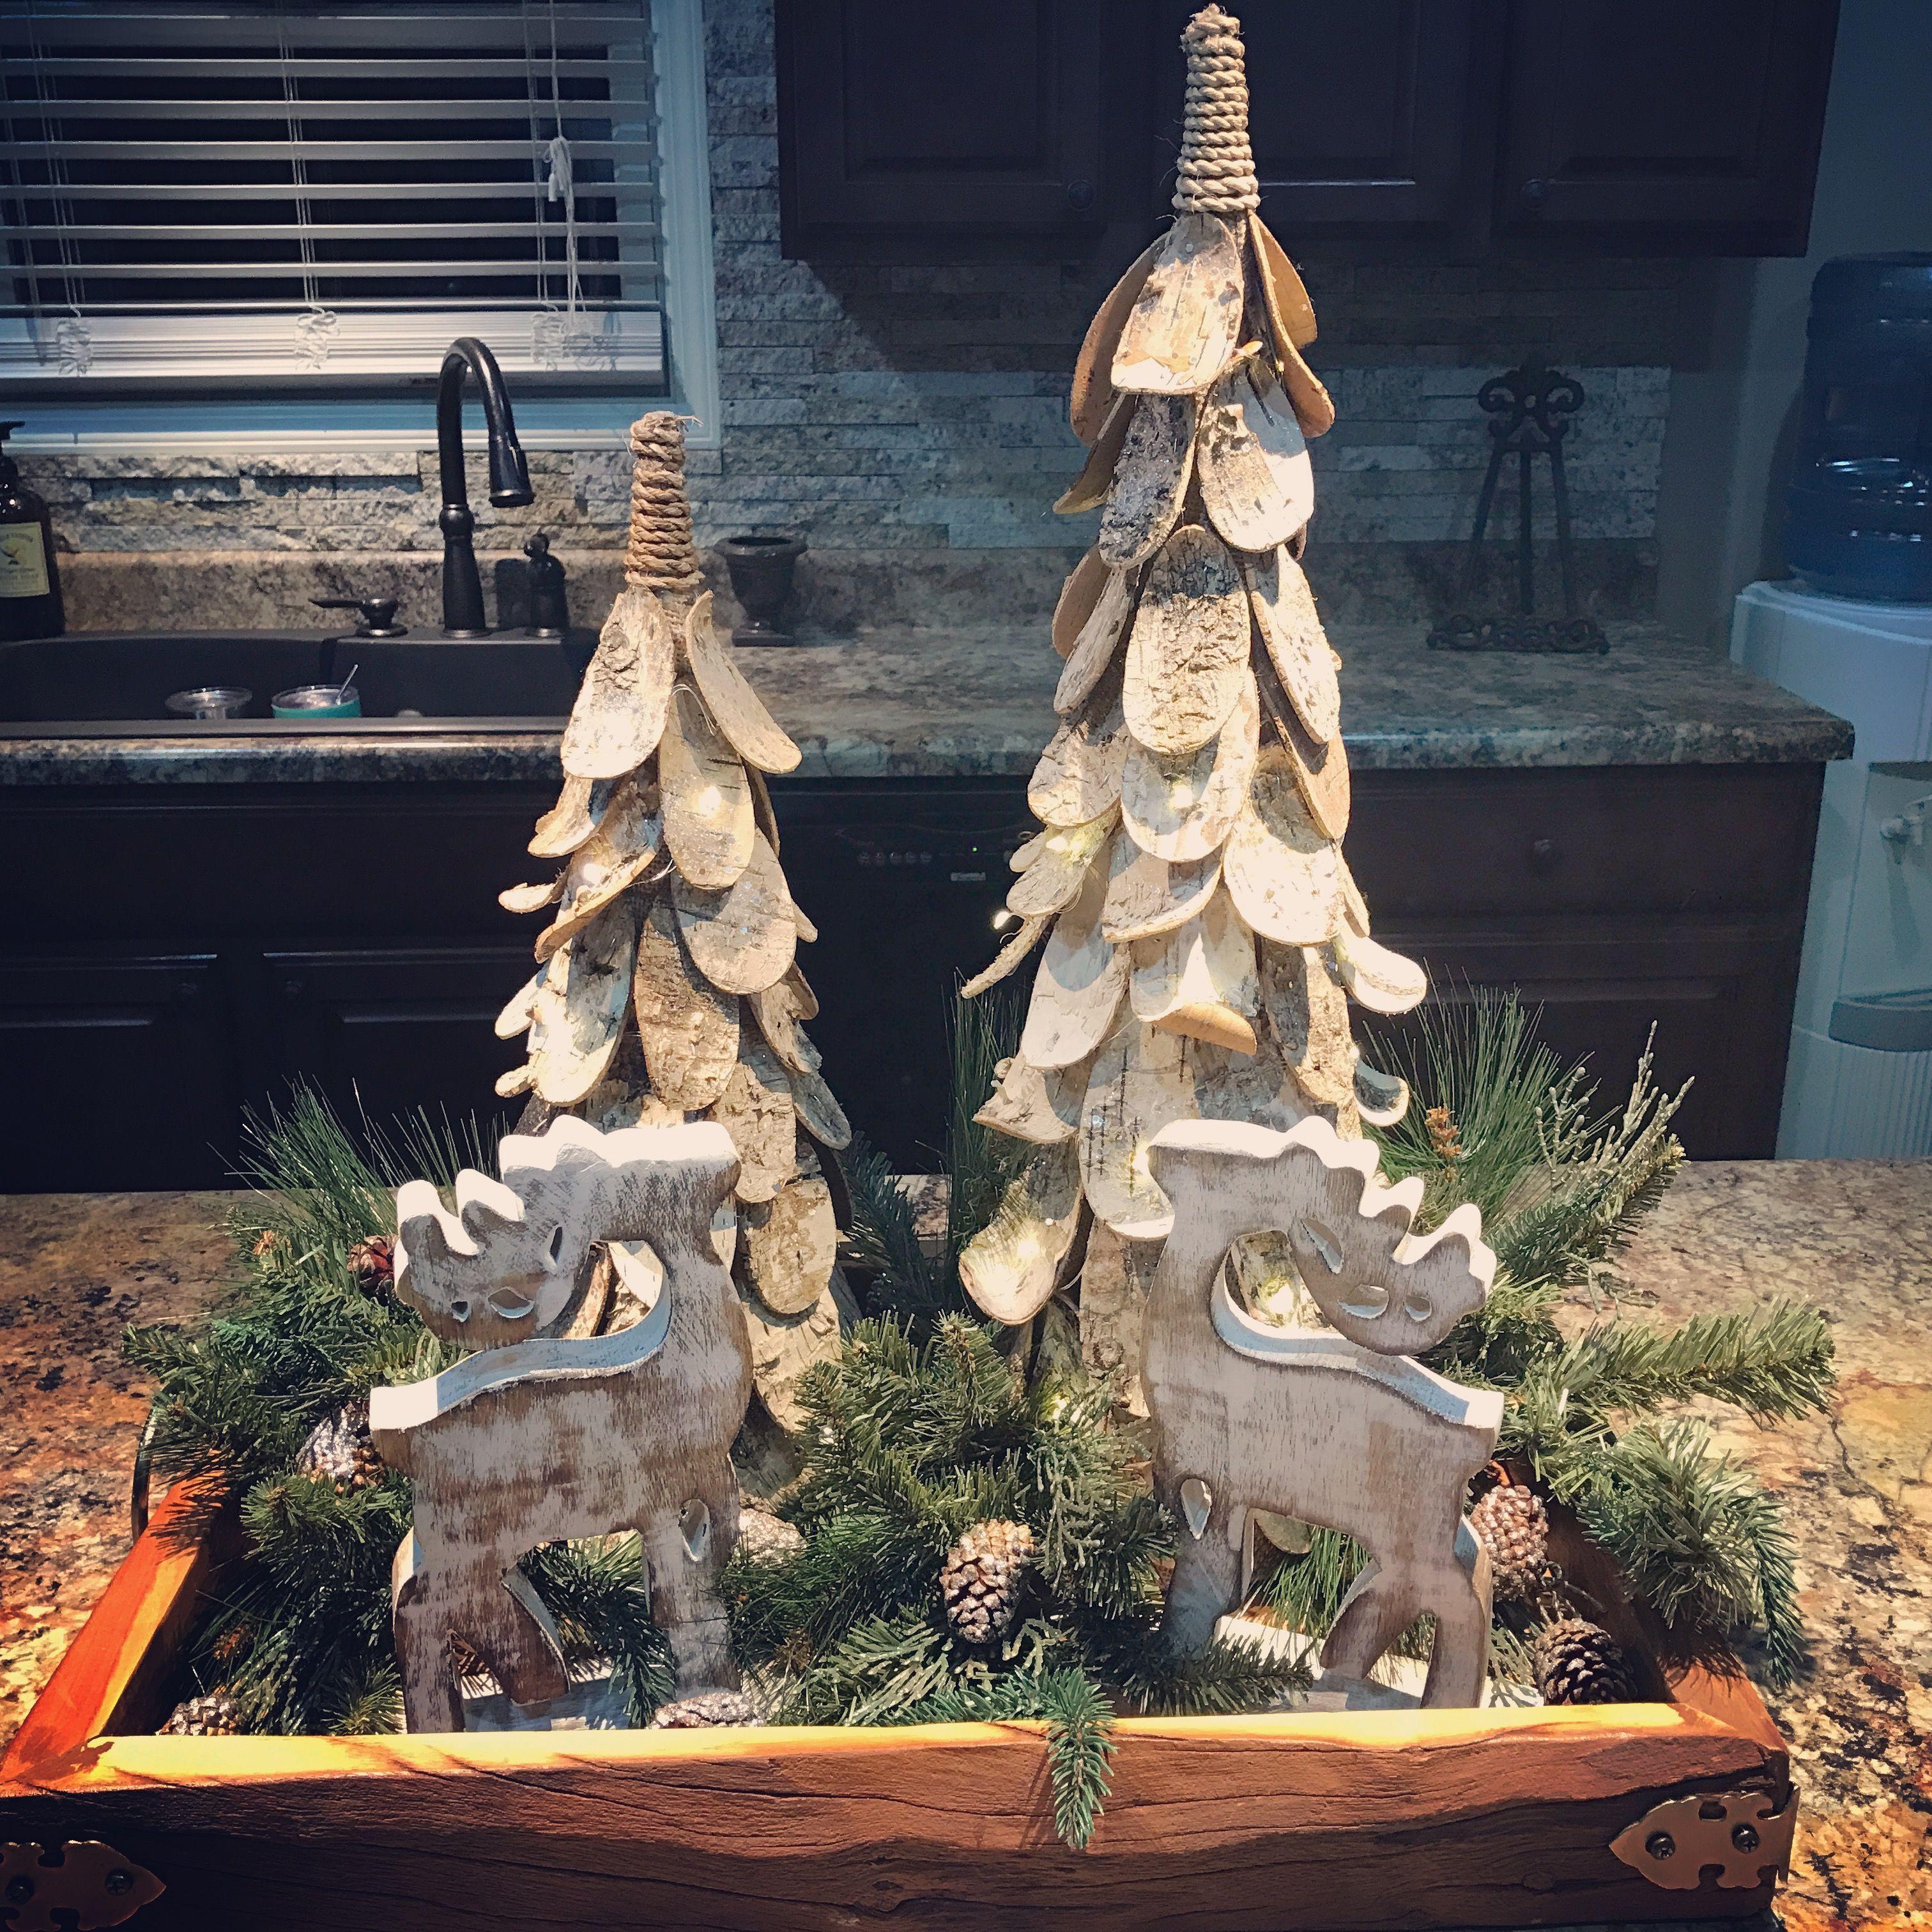 Island Christmas Theme.Christmas Woodland Theme Kitchen Island Centerpiece Items